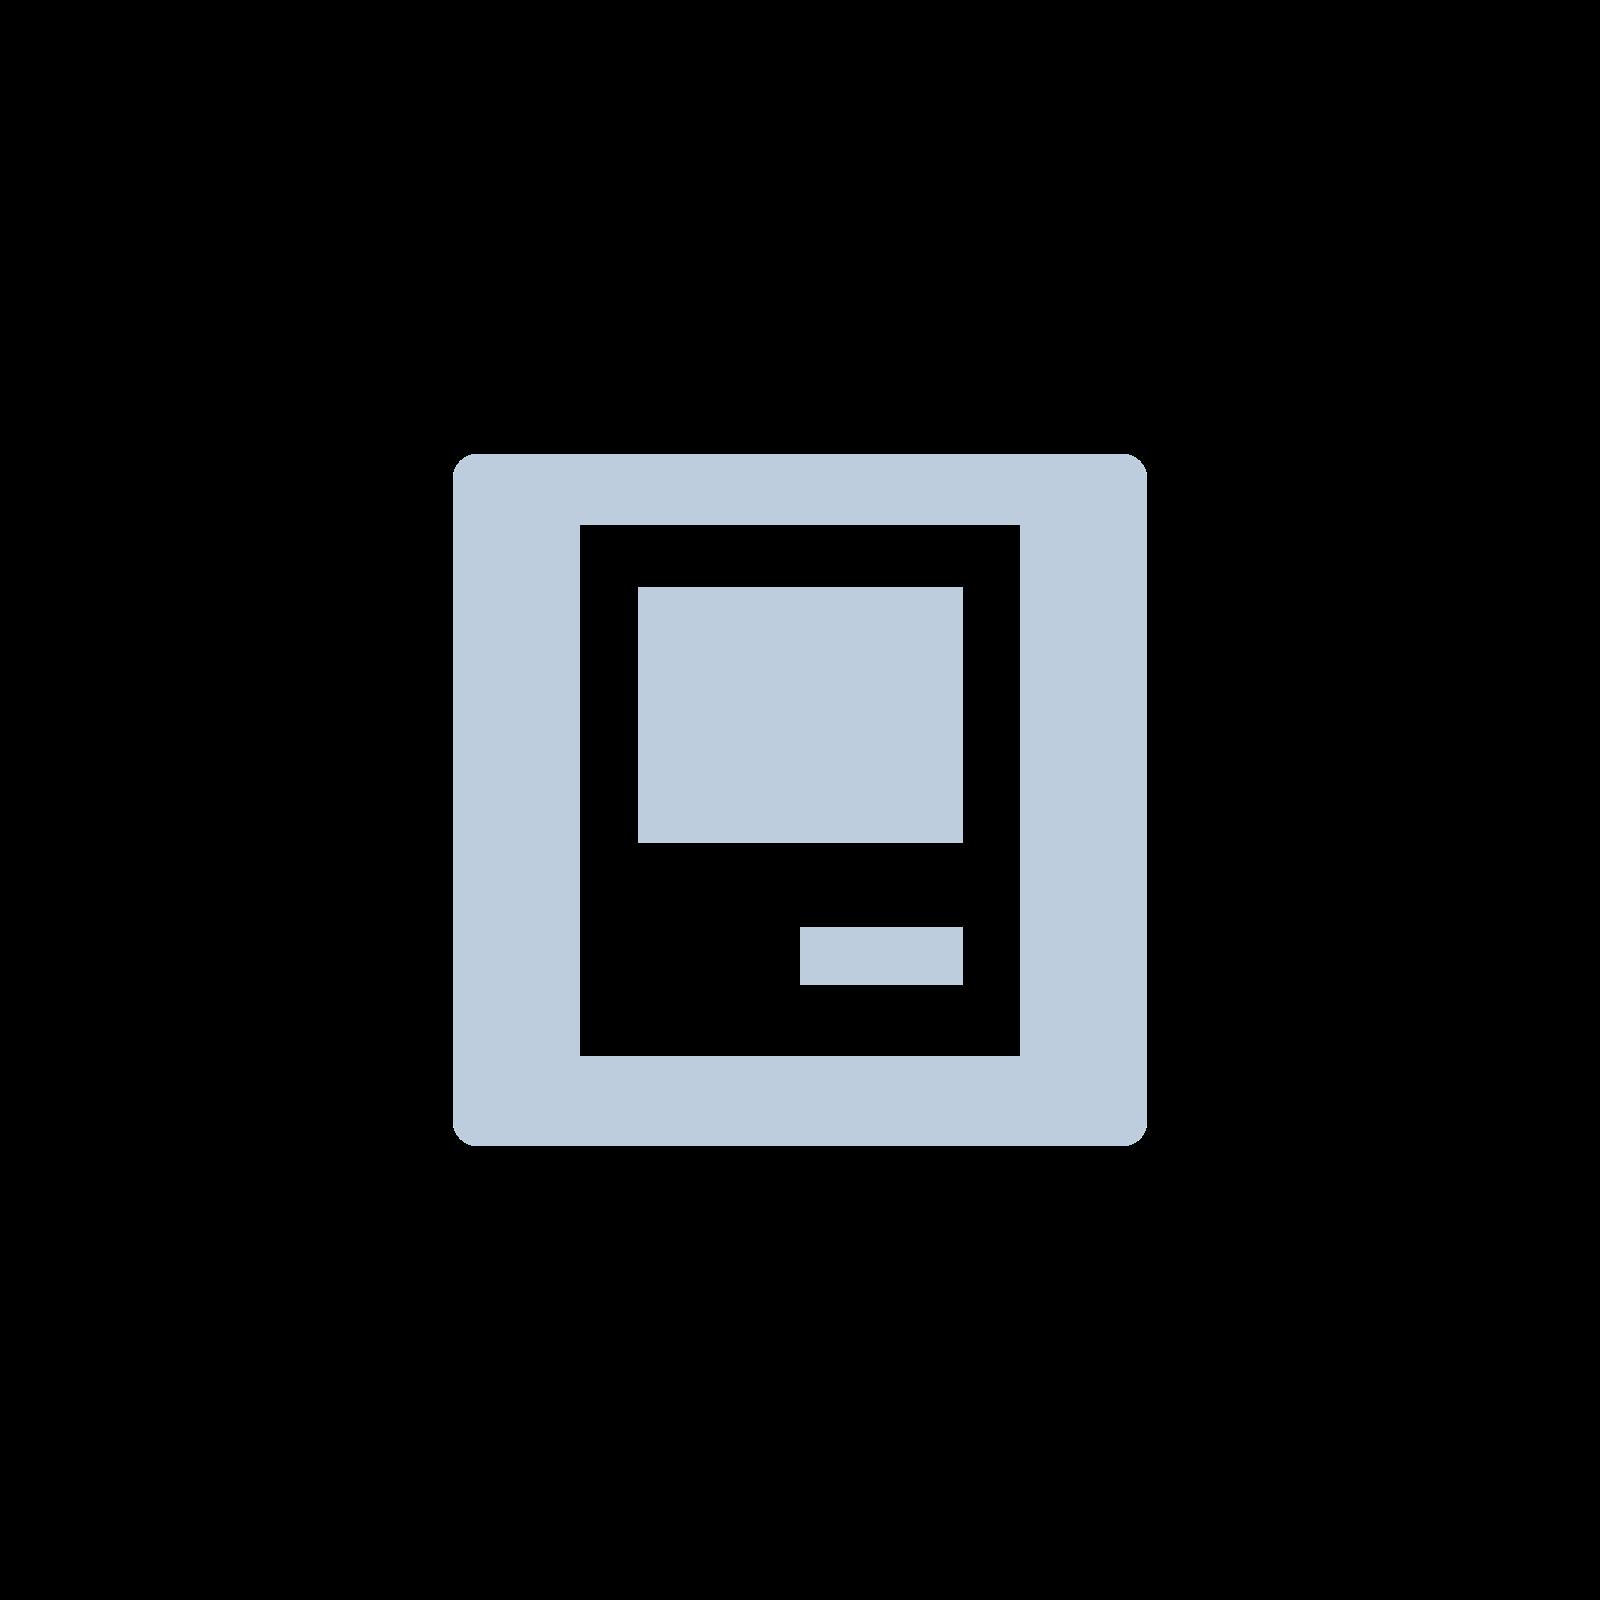 iPad mini 2 128GB Wi-Fi + Cellular Space Grau